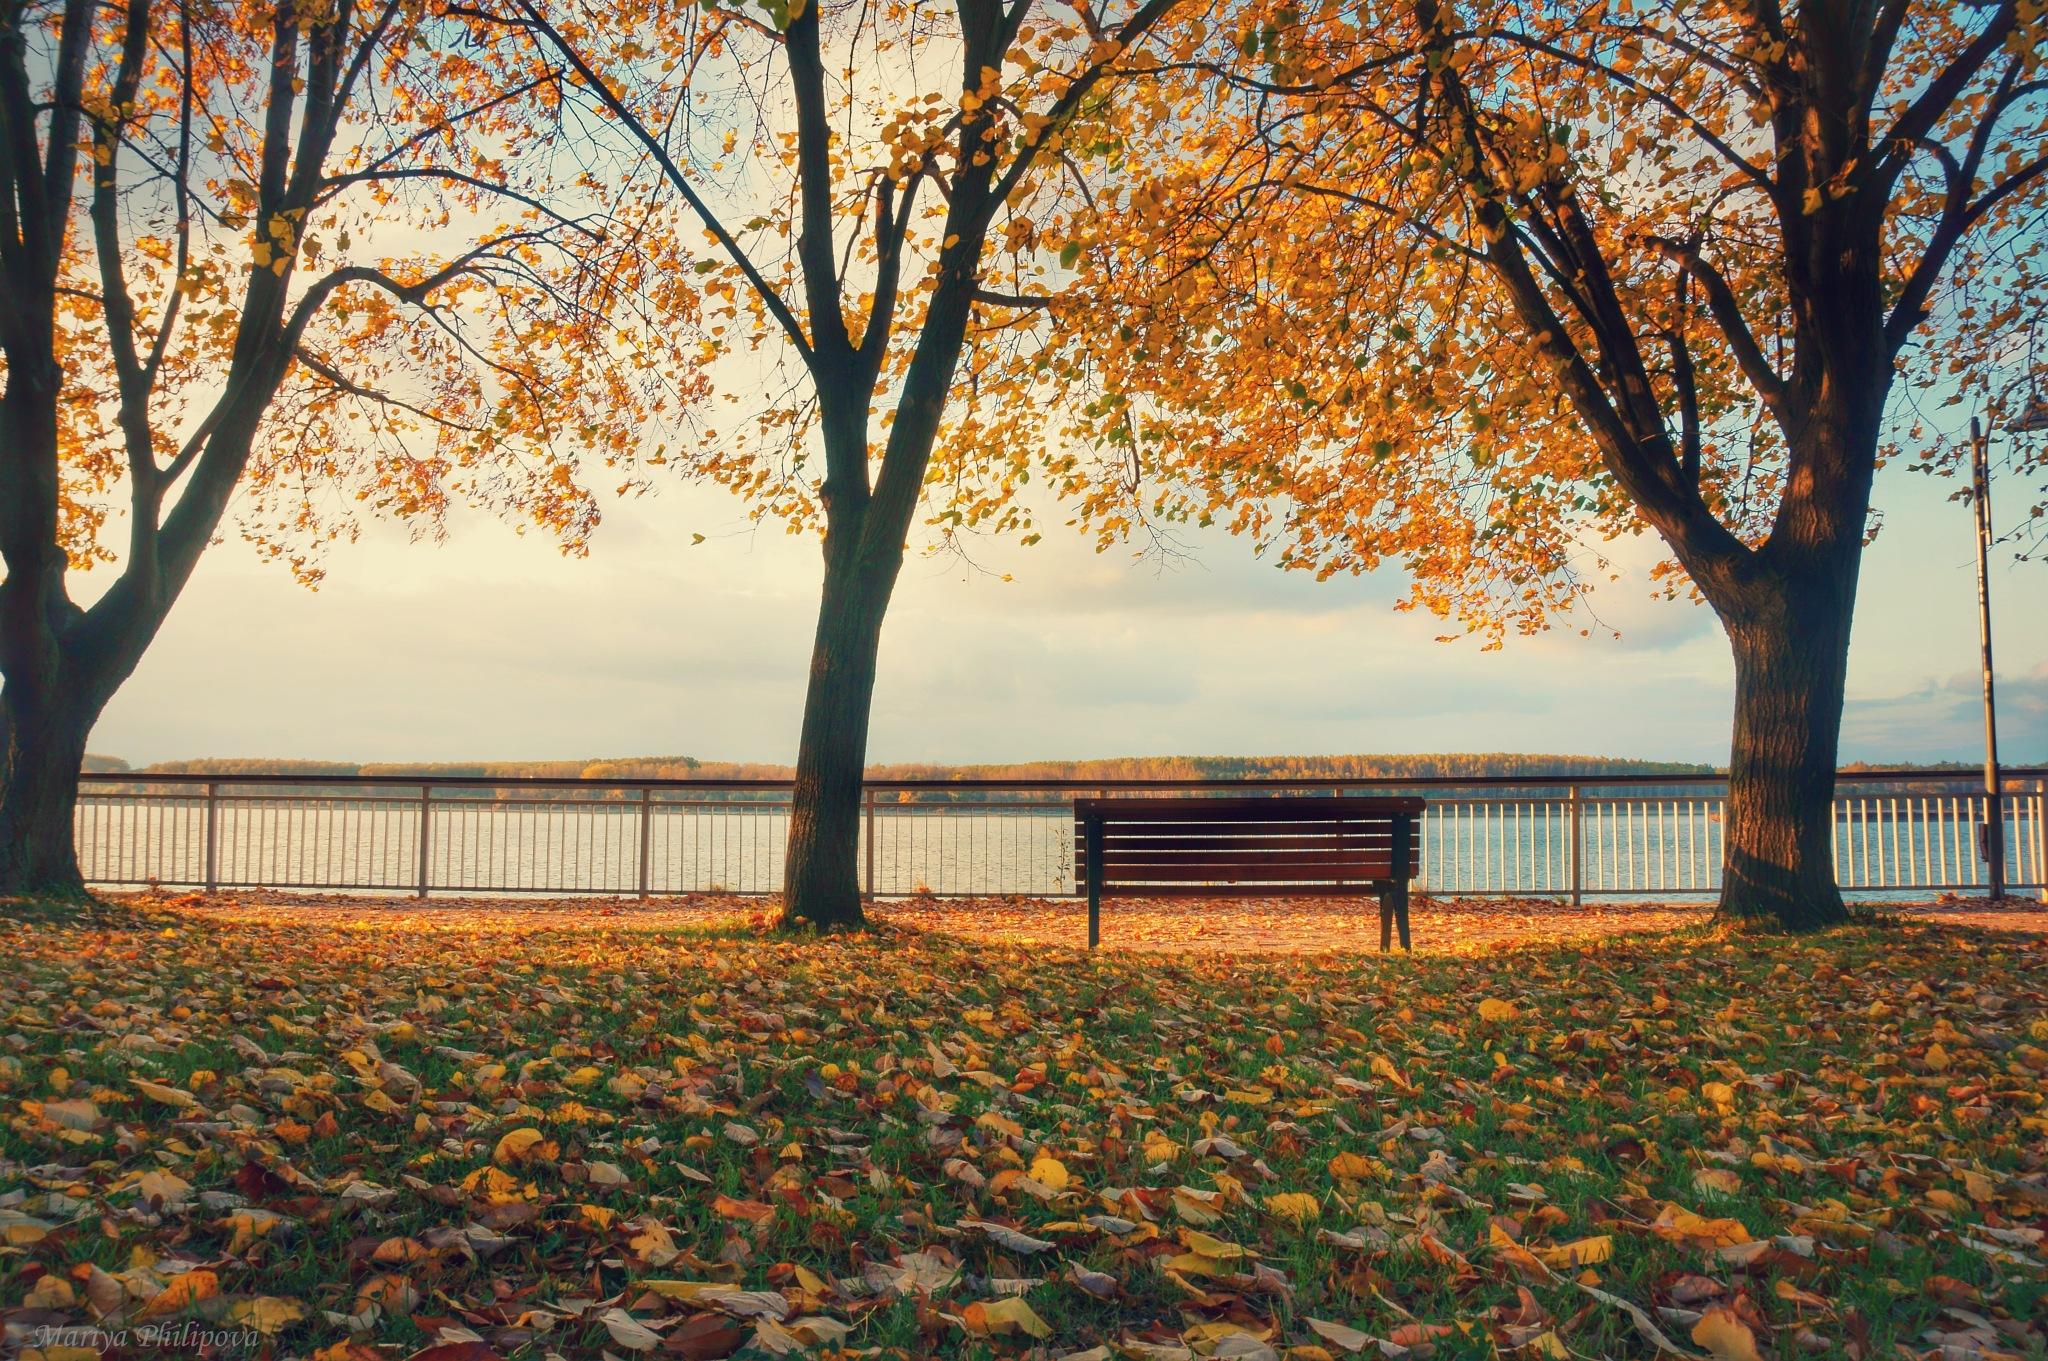 When autumn leaves start to fall by MariyaPhilipova